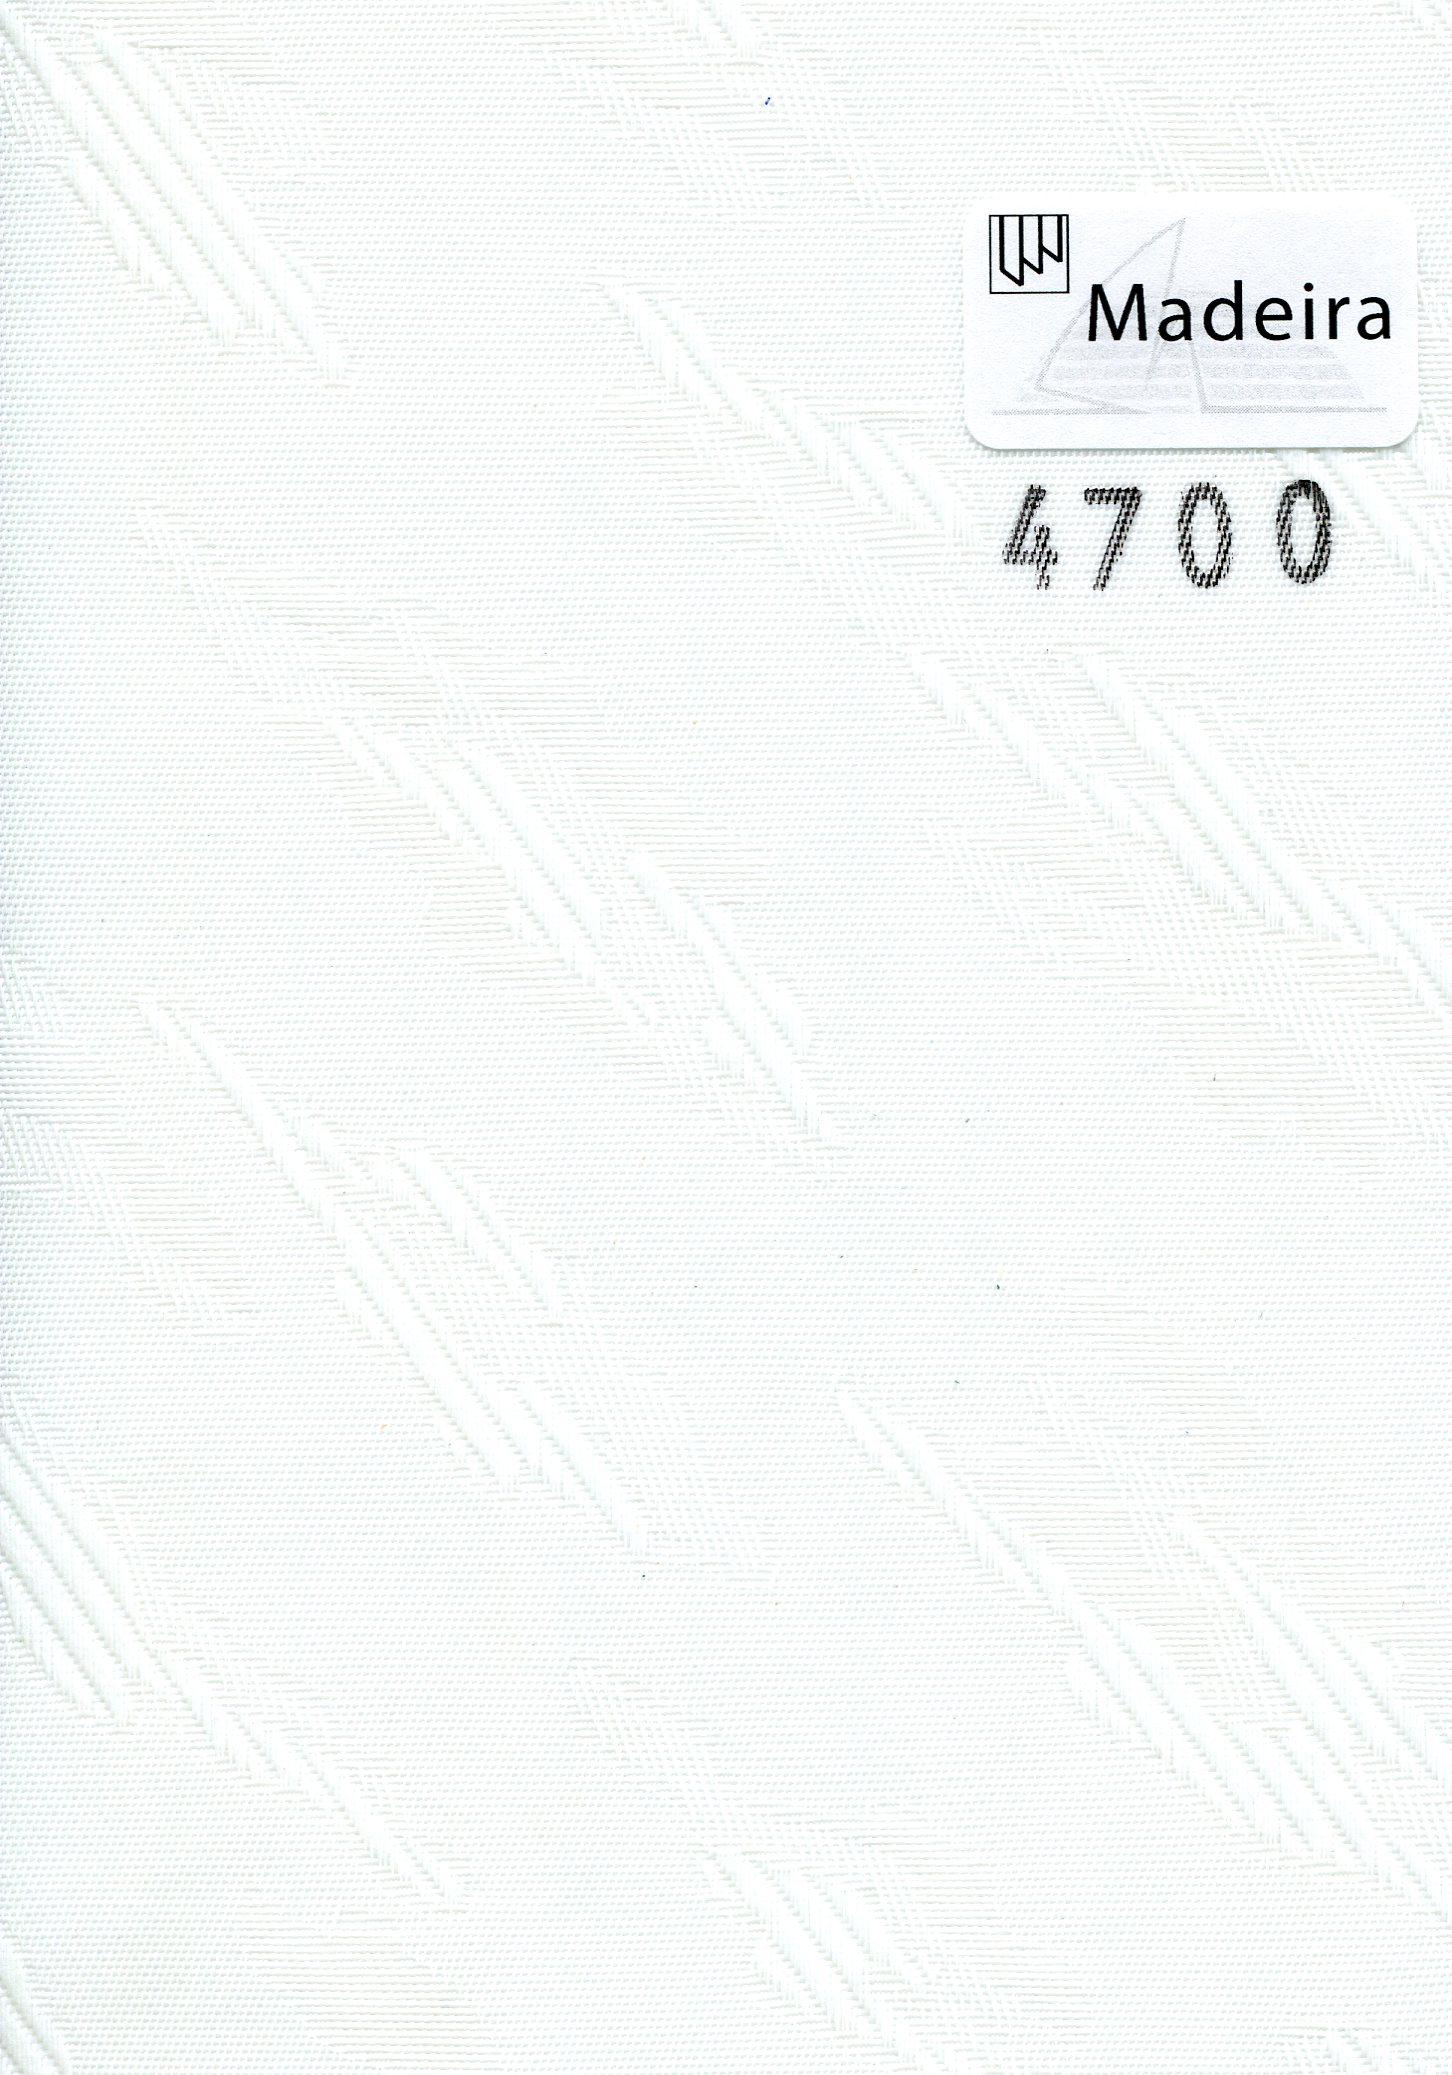 Madeira 4700